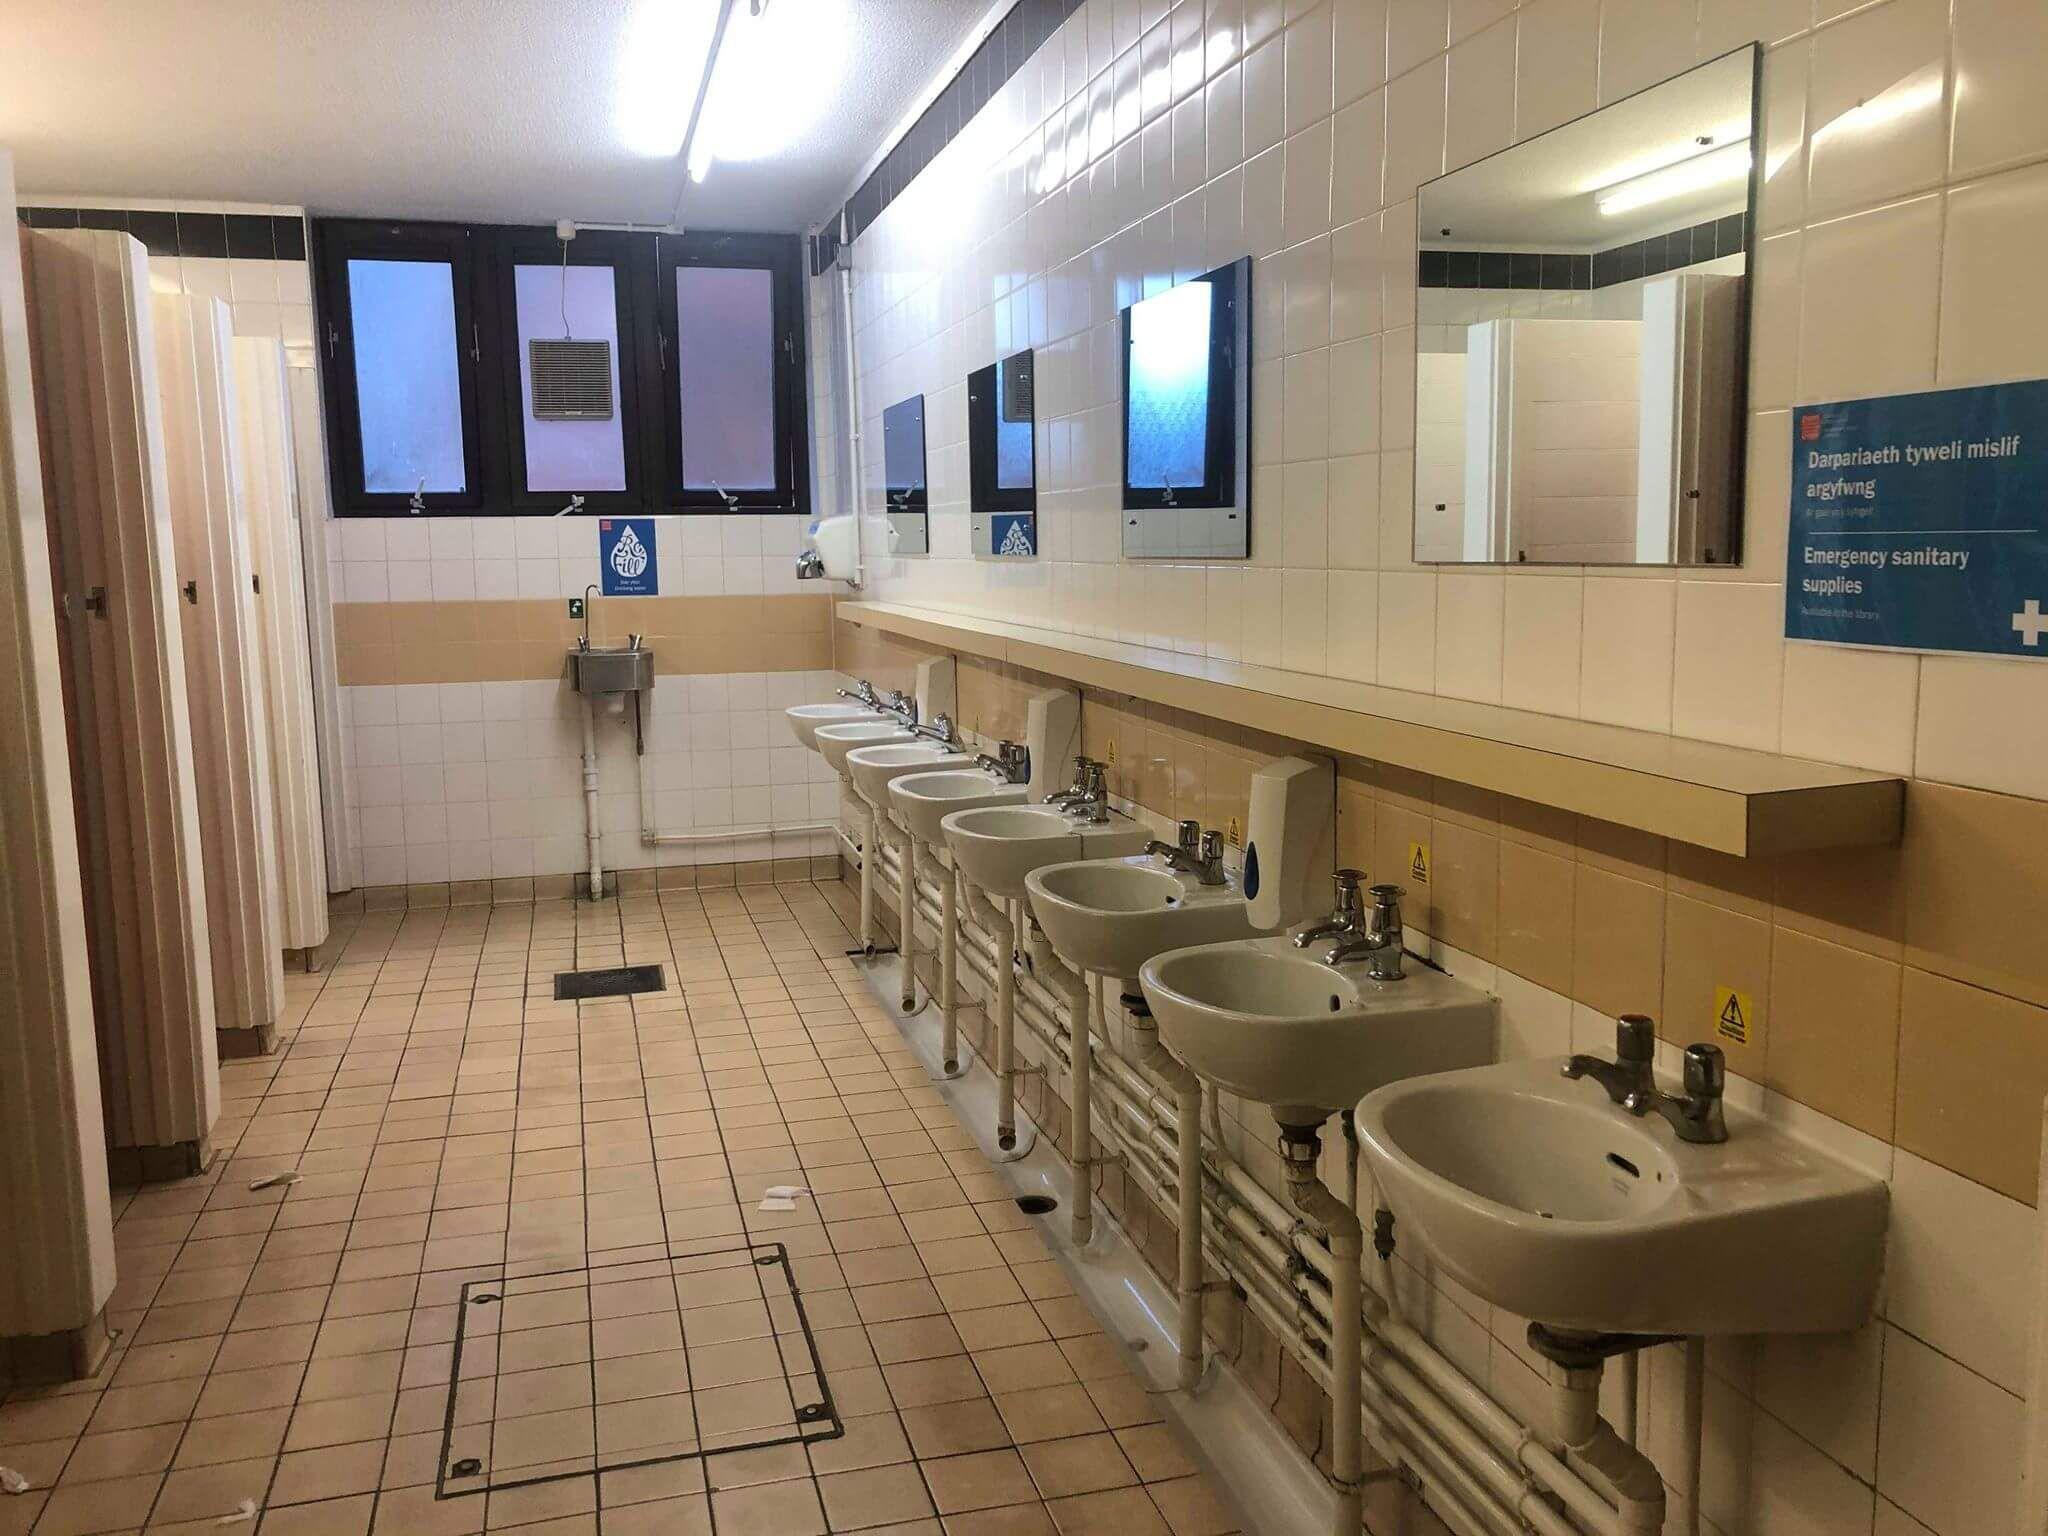 Image may contain: Indoors, Interior Design, Cafeteria, Restaurant, Floor, Flooring, Double Sink